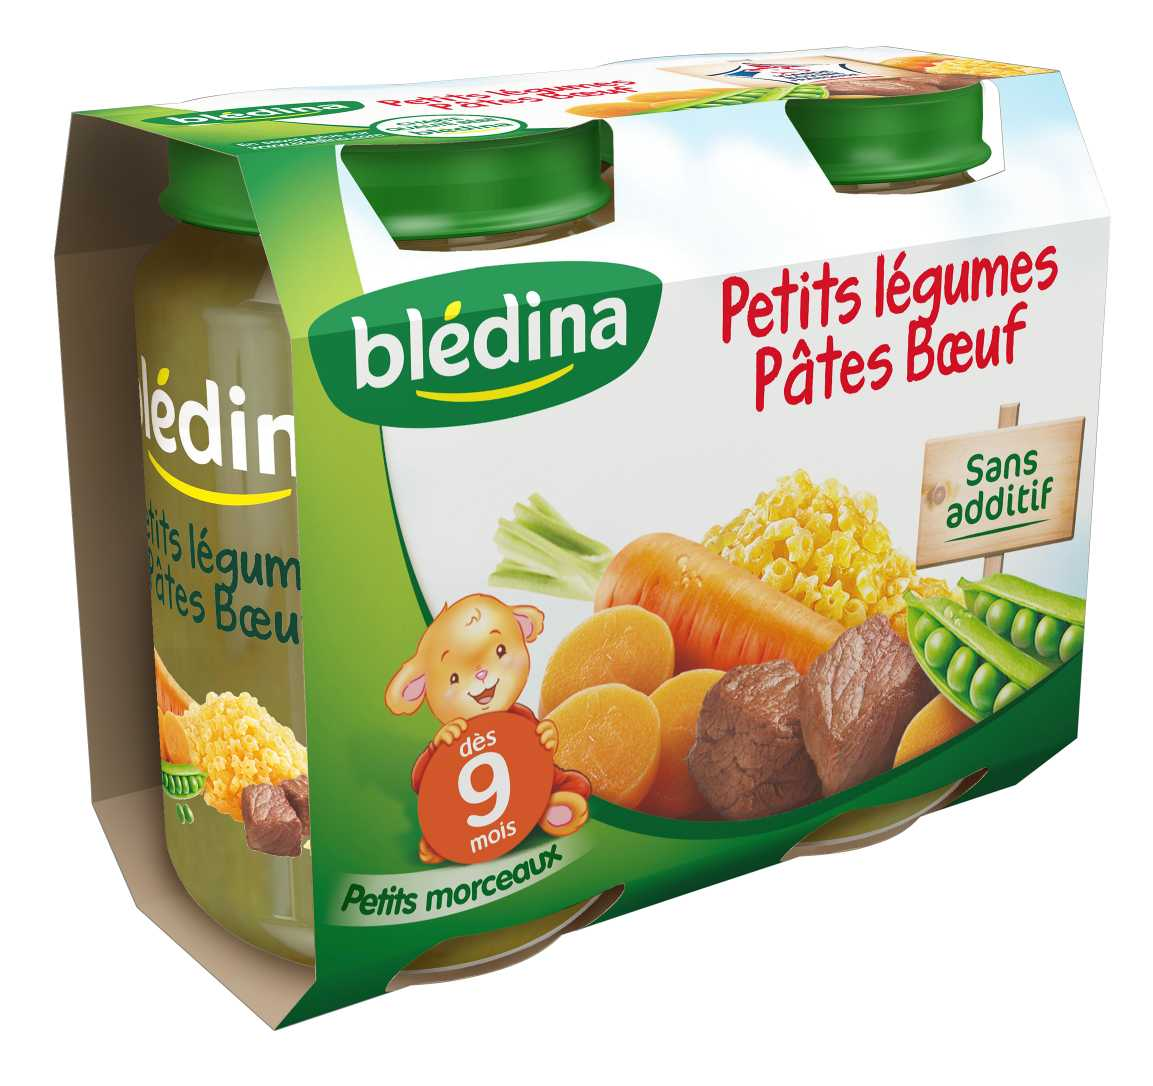 Pot Petits légumes Pâtes Bœuf 2x200g